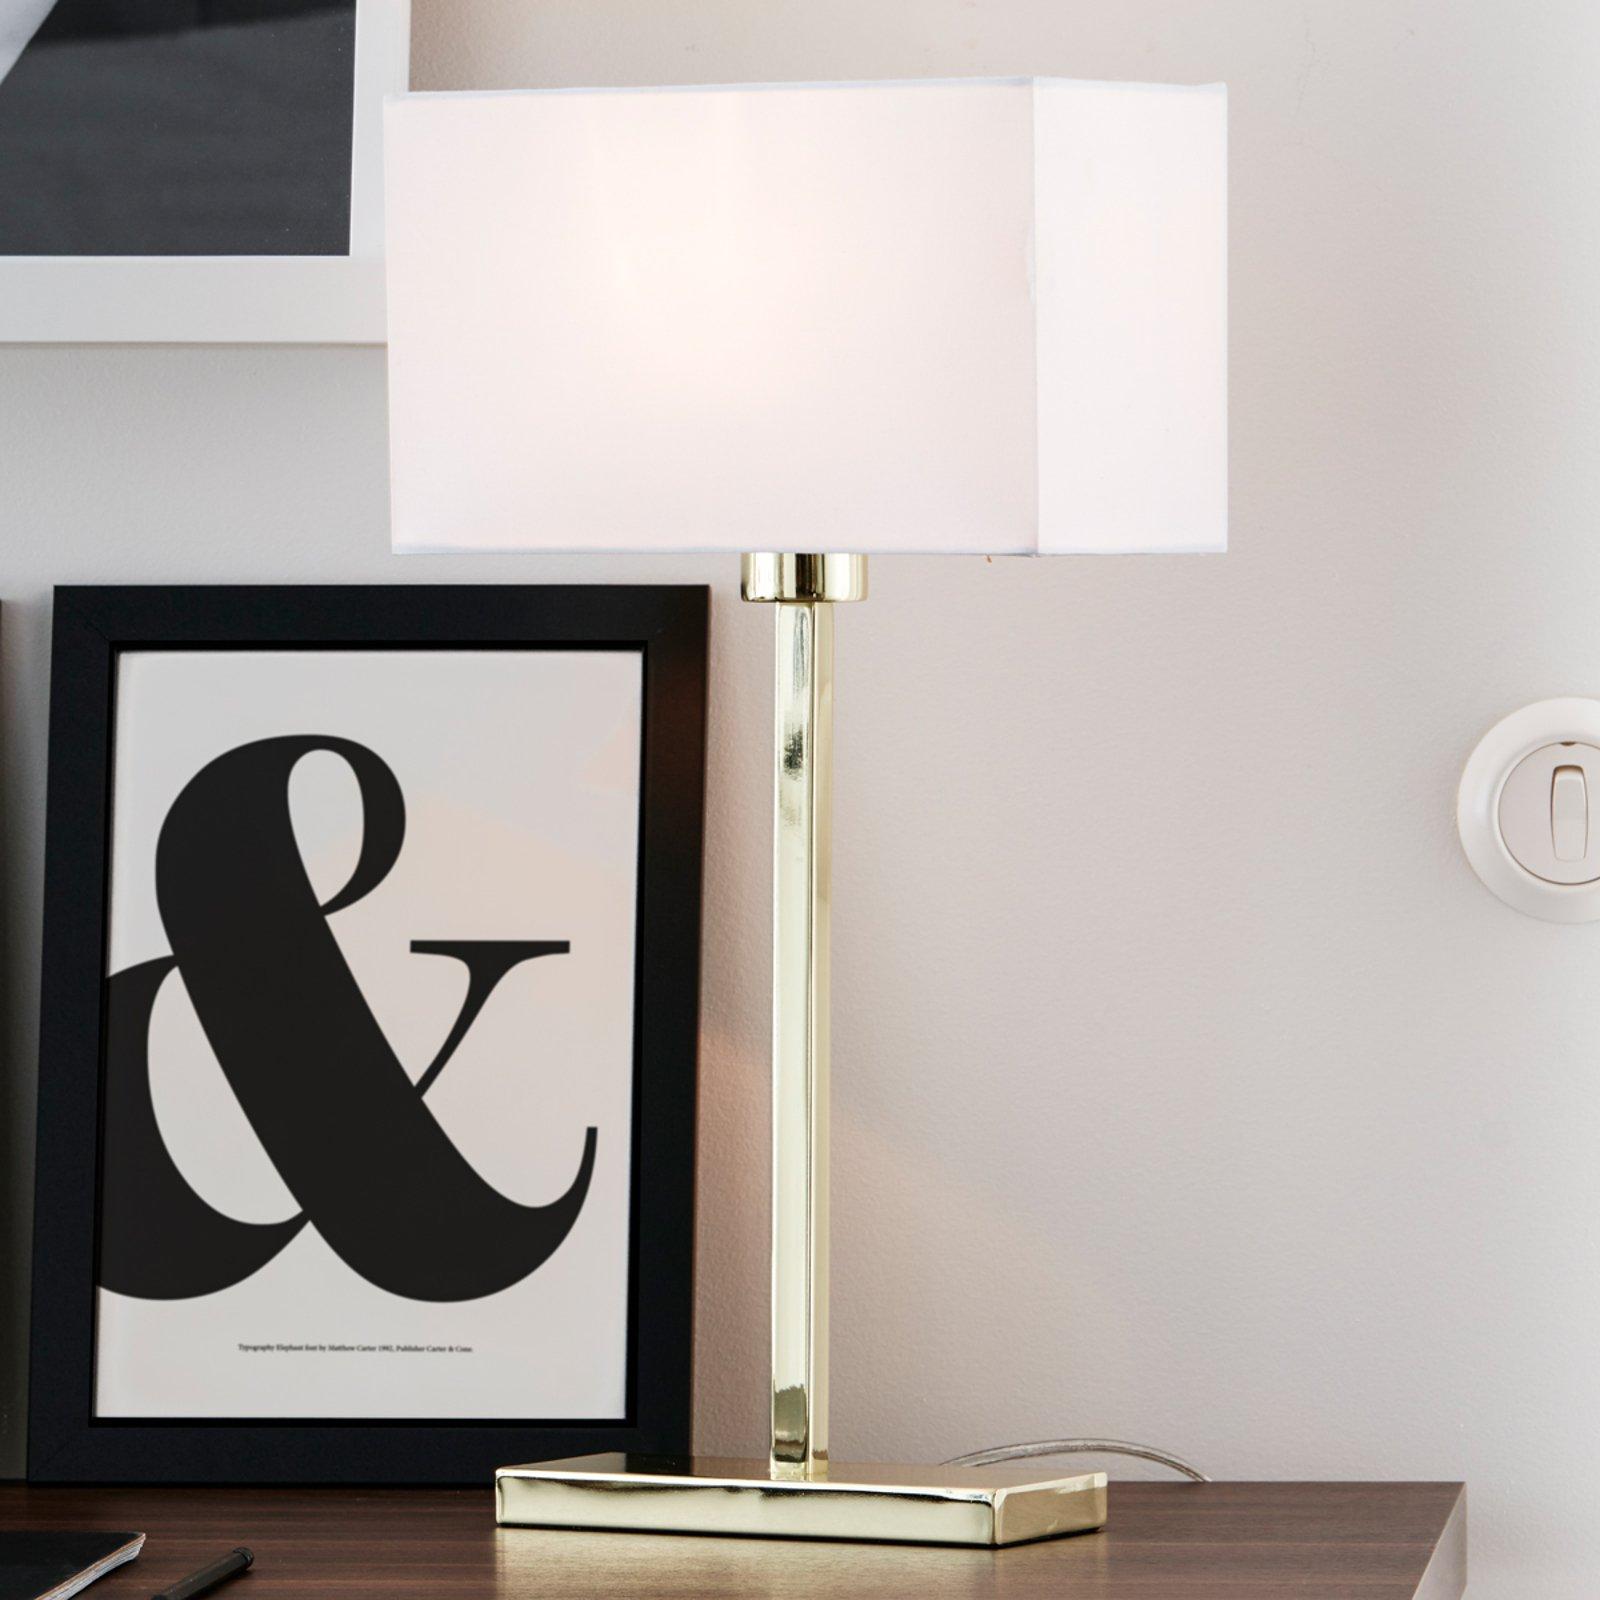 Rettlinjet bearbeidet bordlampe Savoy USB